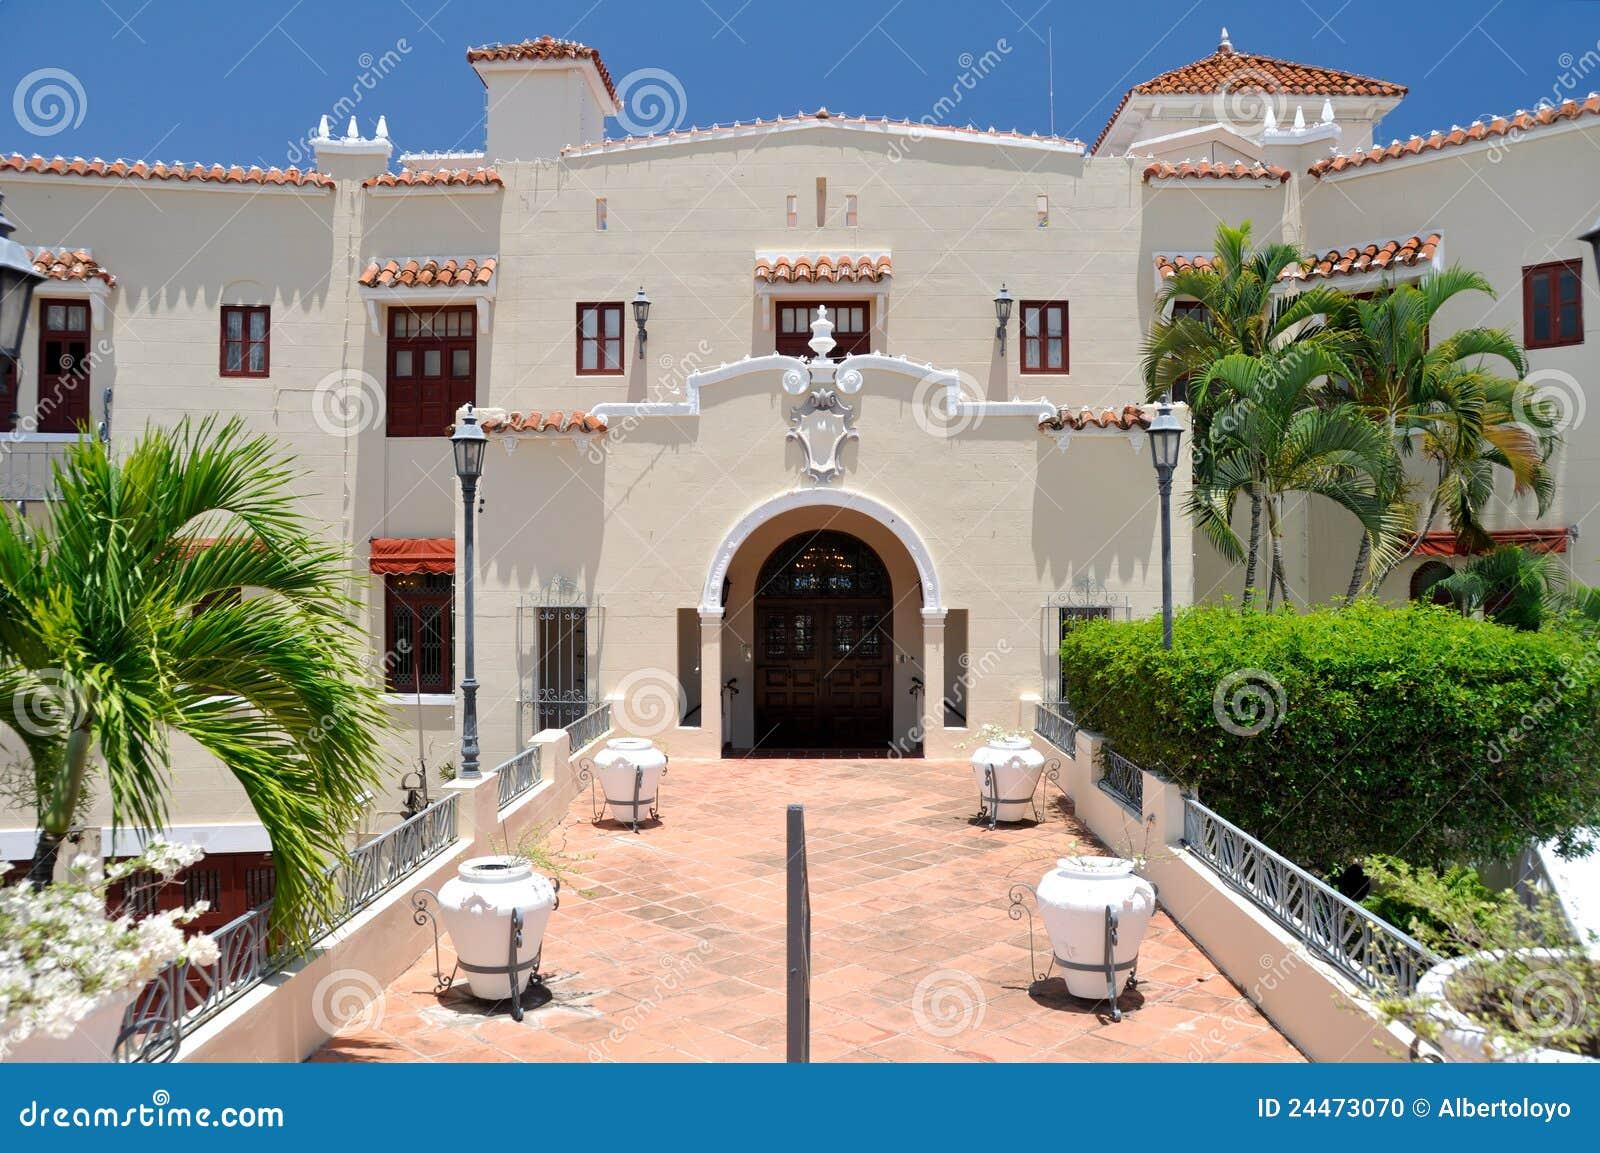 Castillo Serralles Mansion At Ponce Puerto Rico Stock Photo Image 24473070